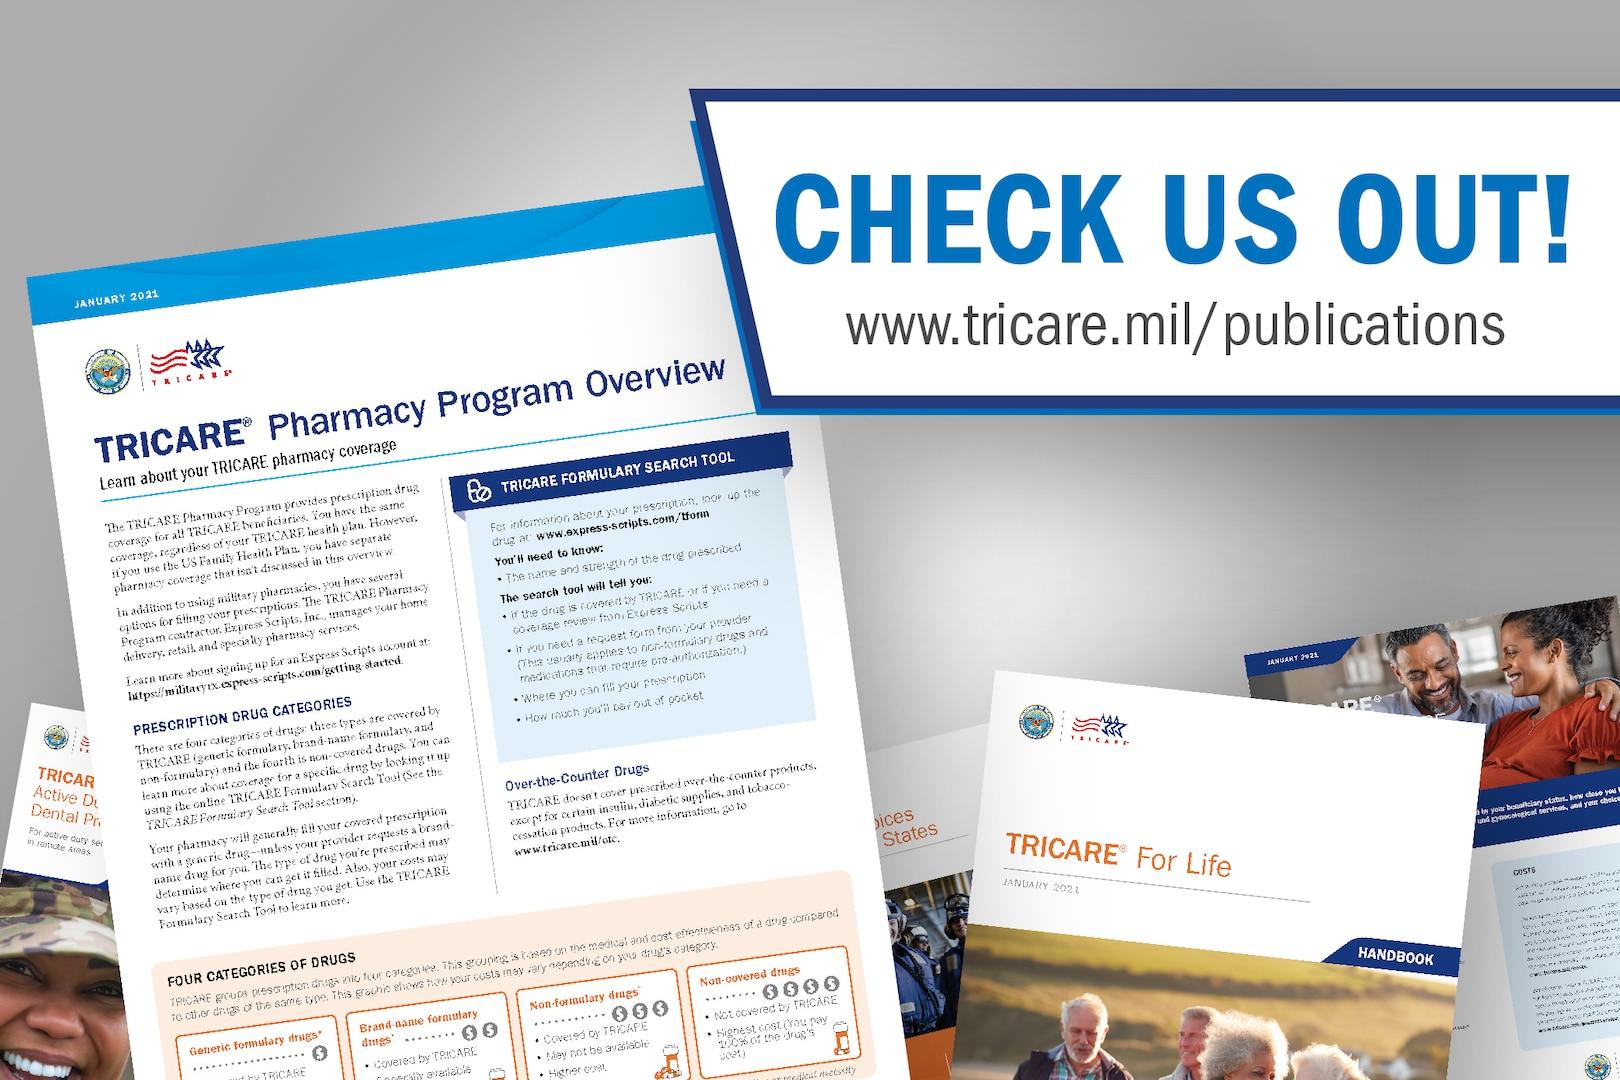 TRICARE Pharmacy Program Overview